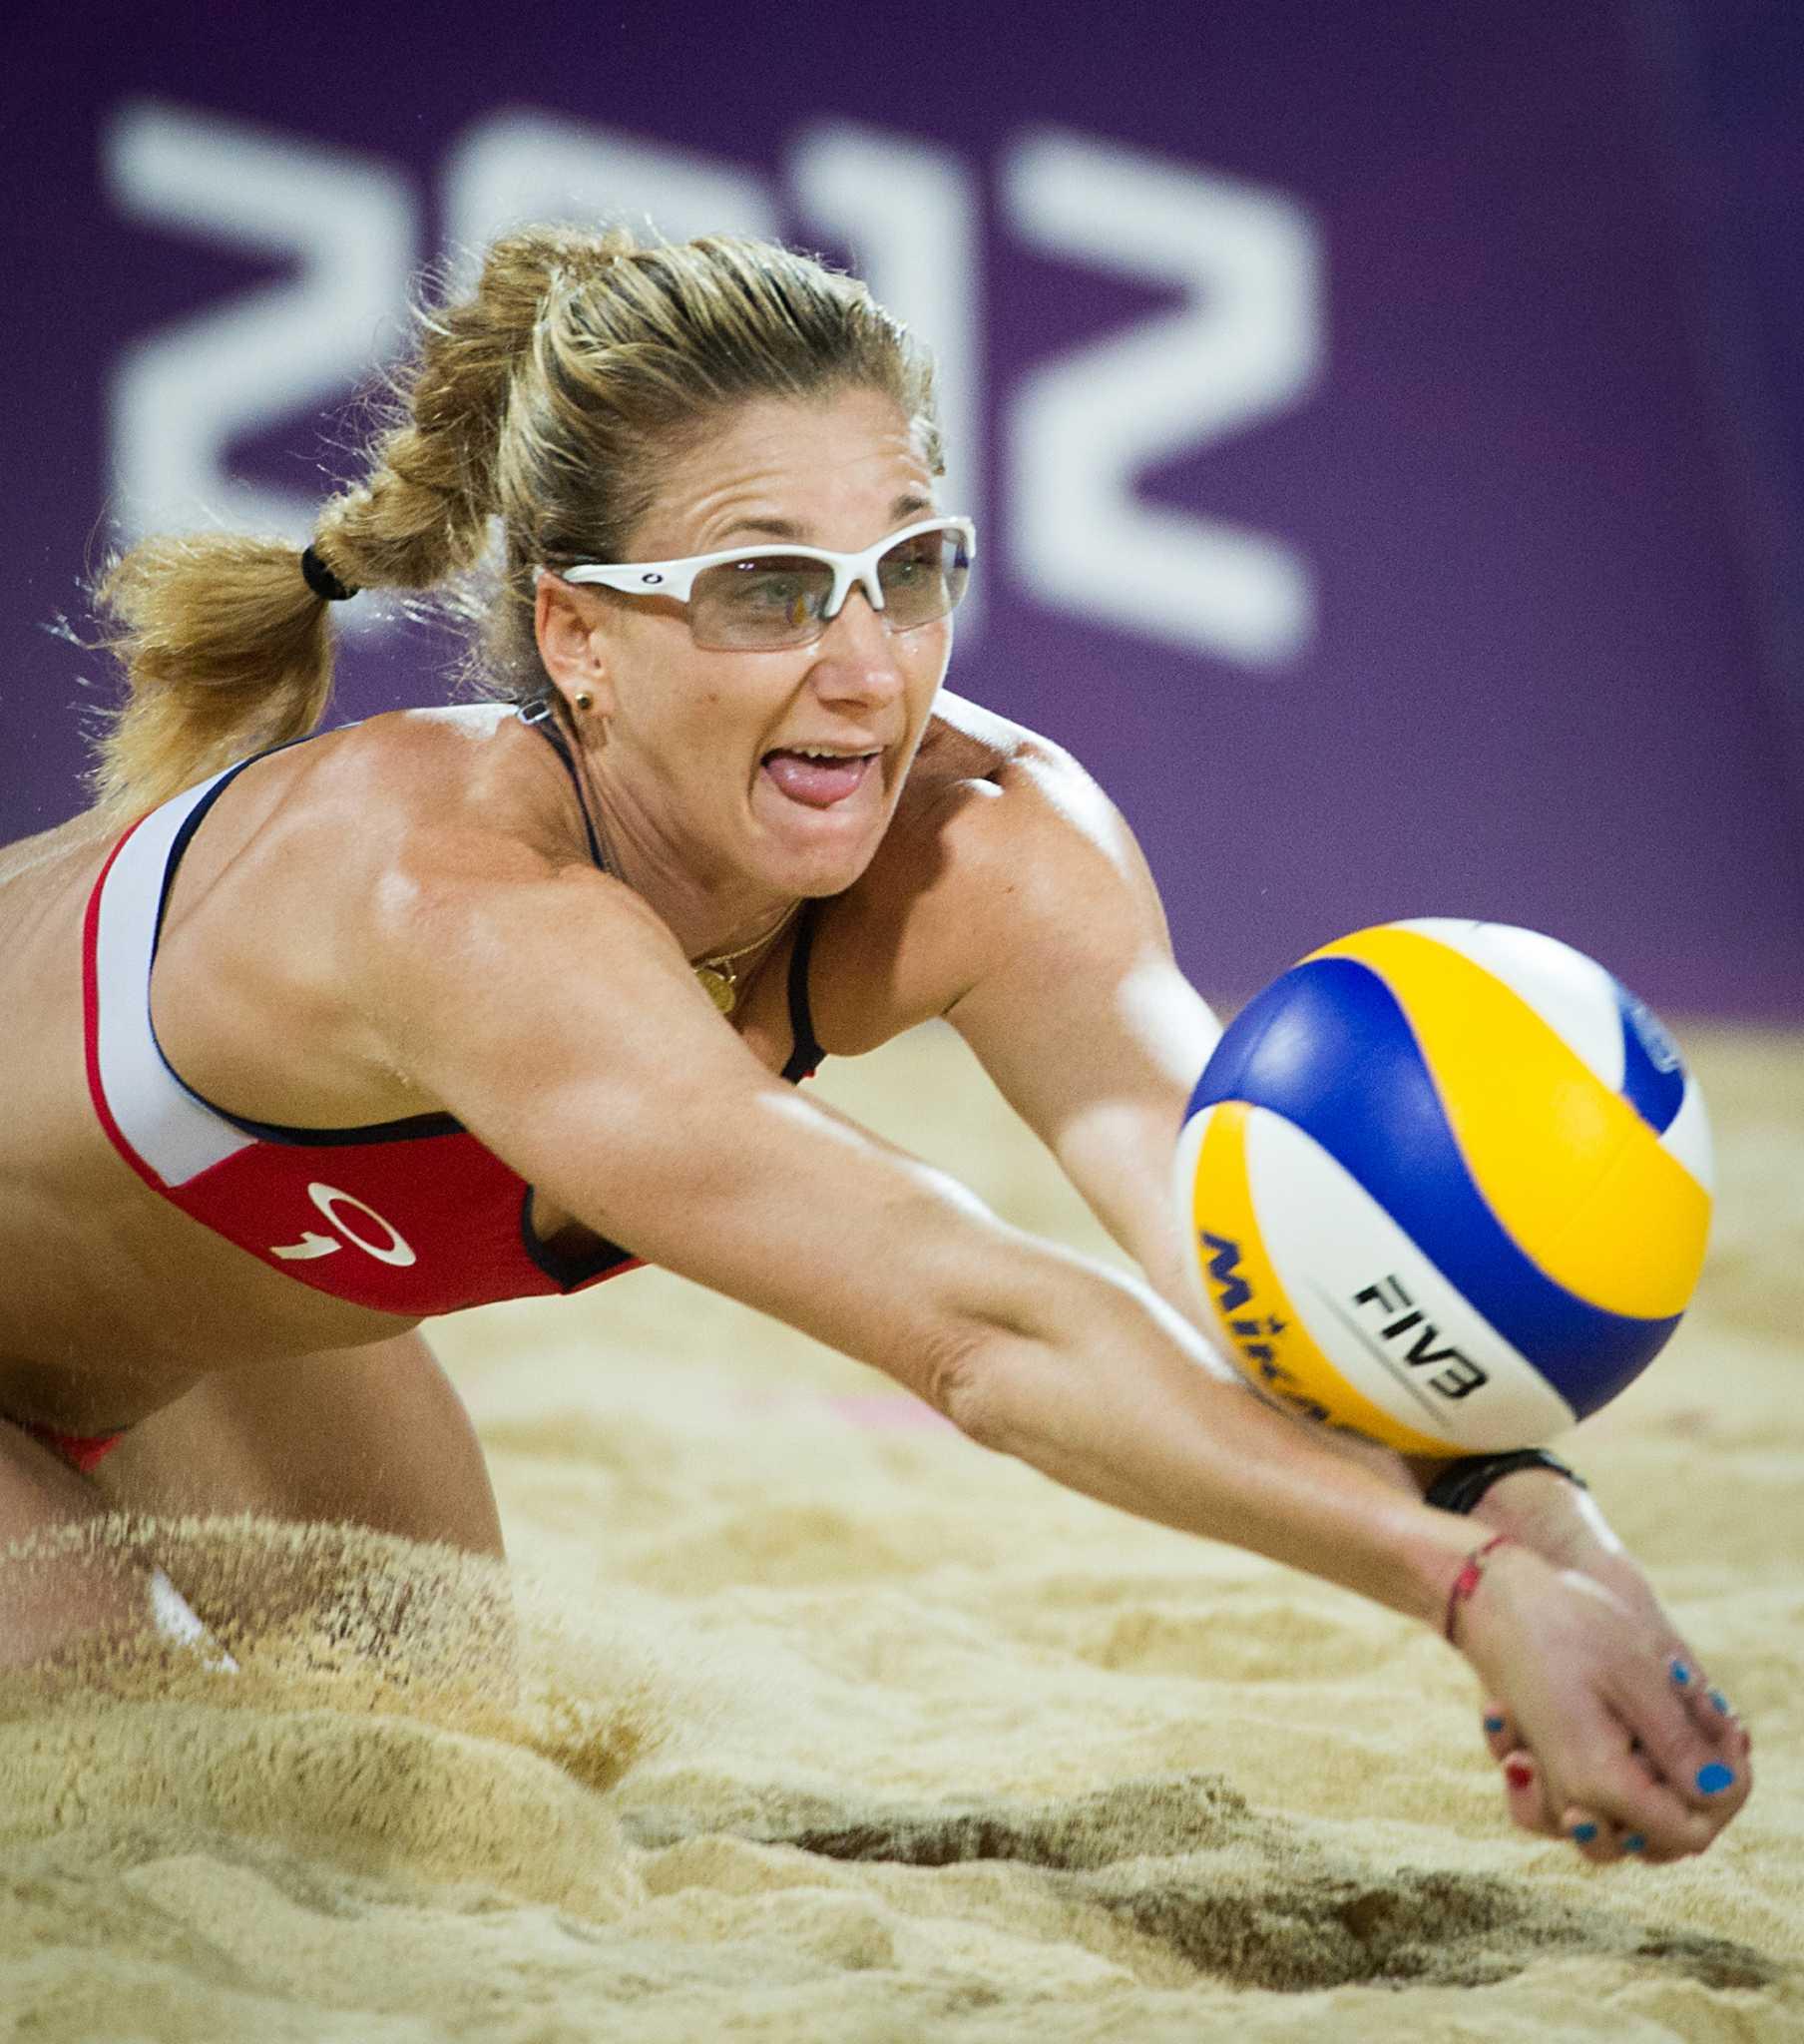 London Olympics: U.S. mens and womens beach volleyball